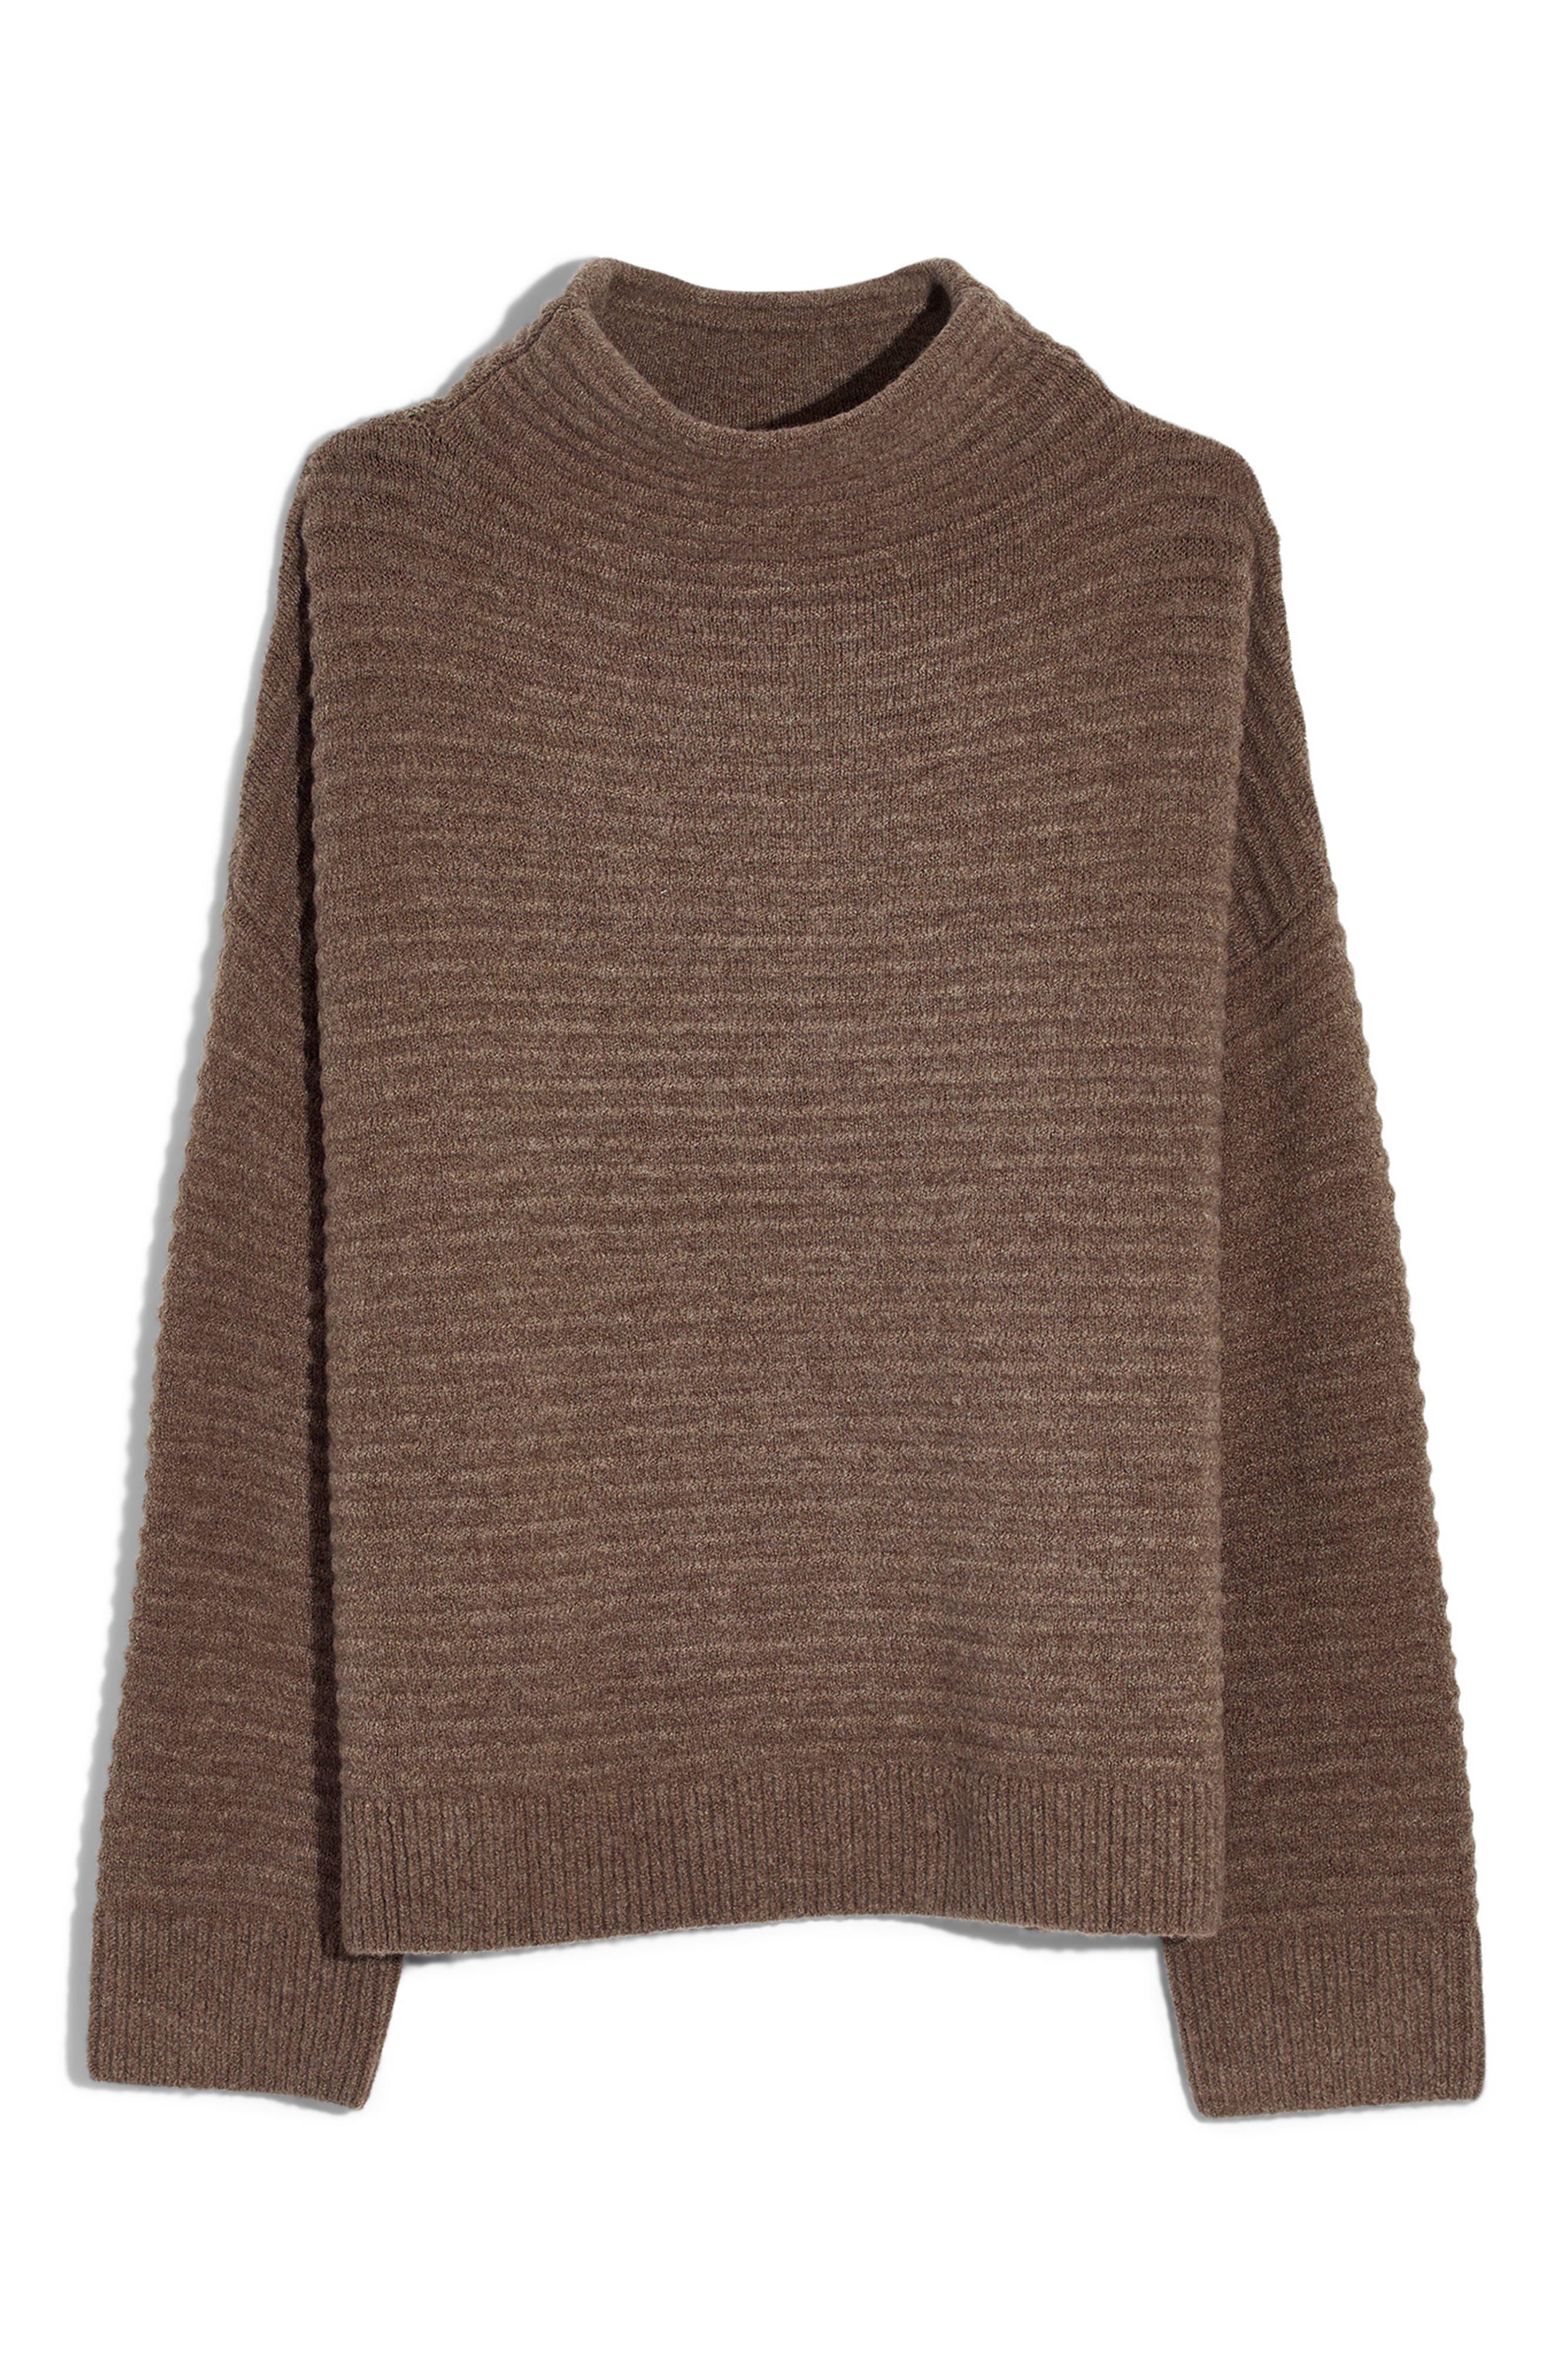 Belmont Mock Neck Sweater,                             Alternate thumbnail 5, color,                             HEATHER ROOT